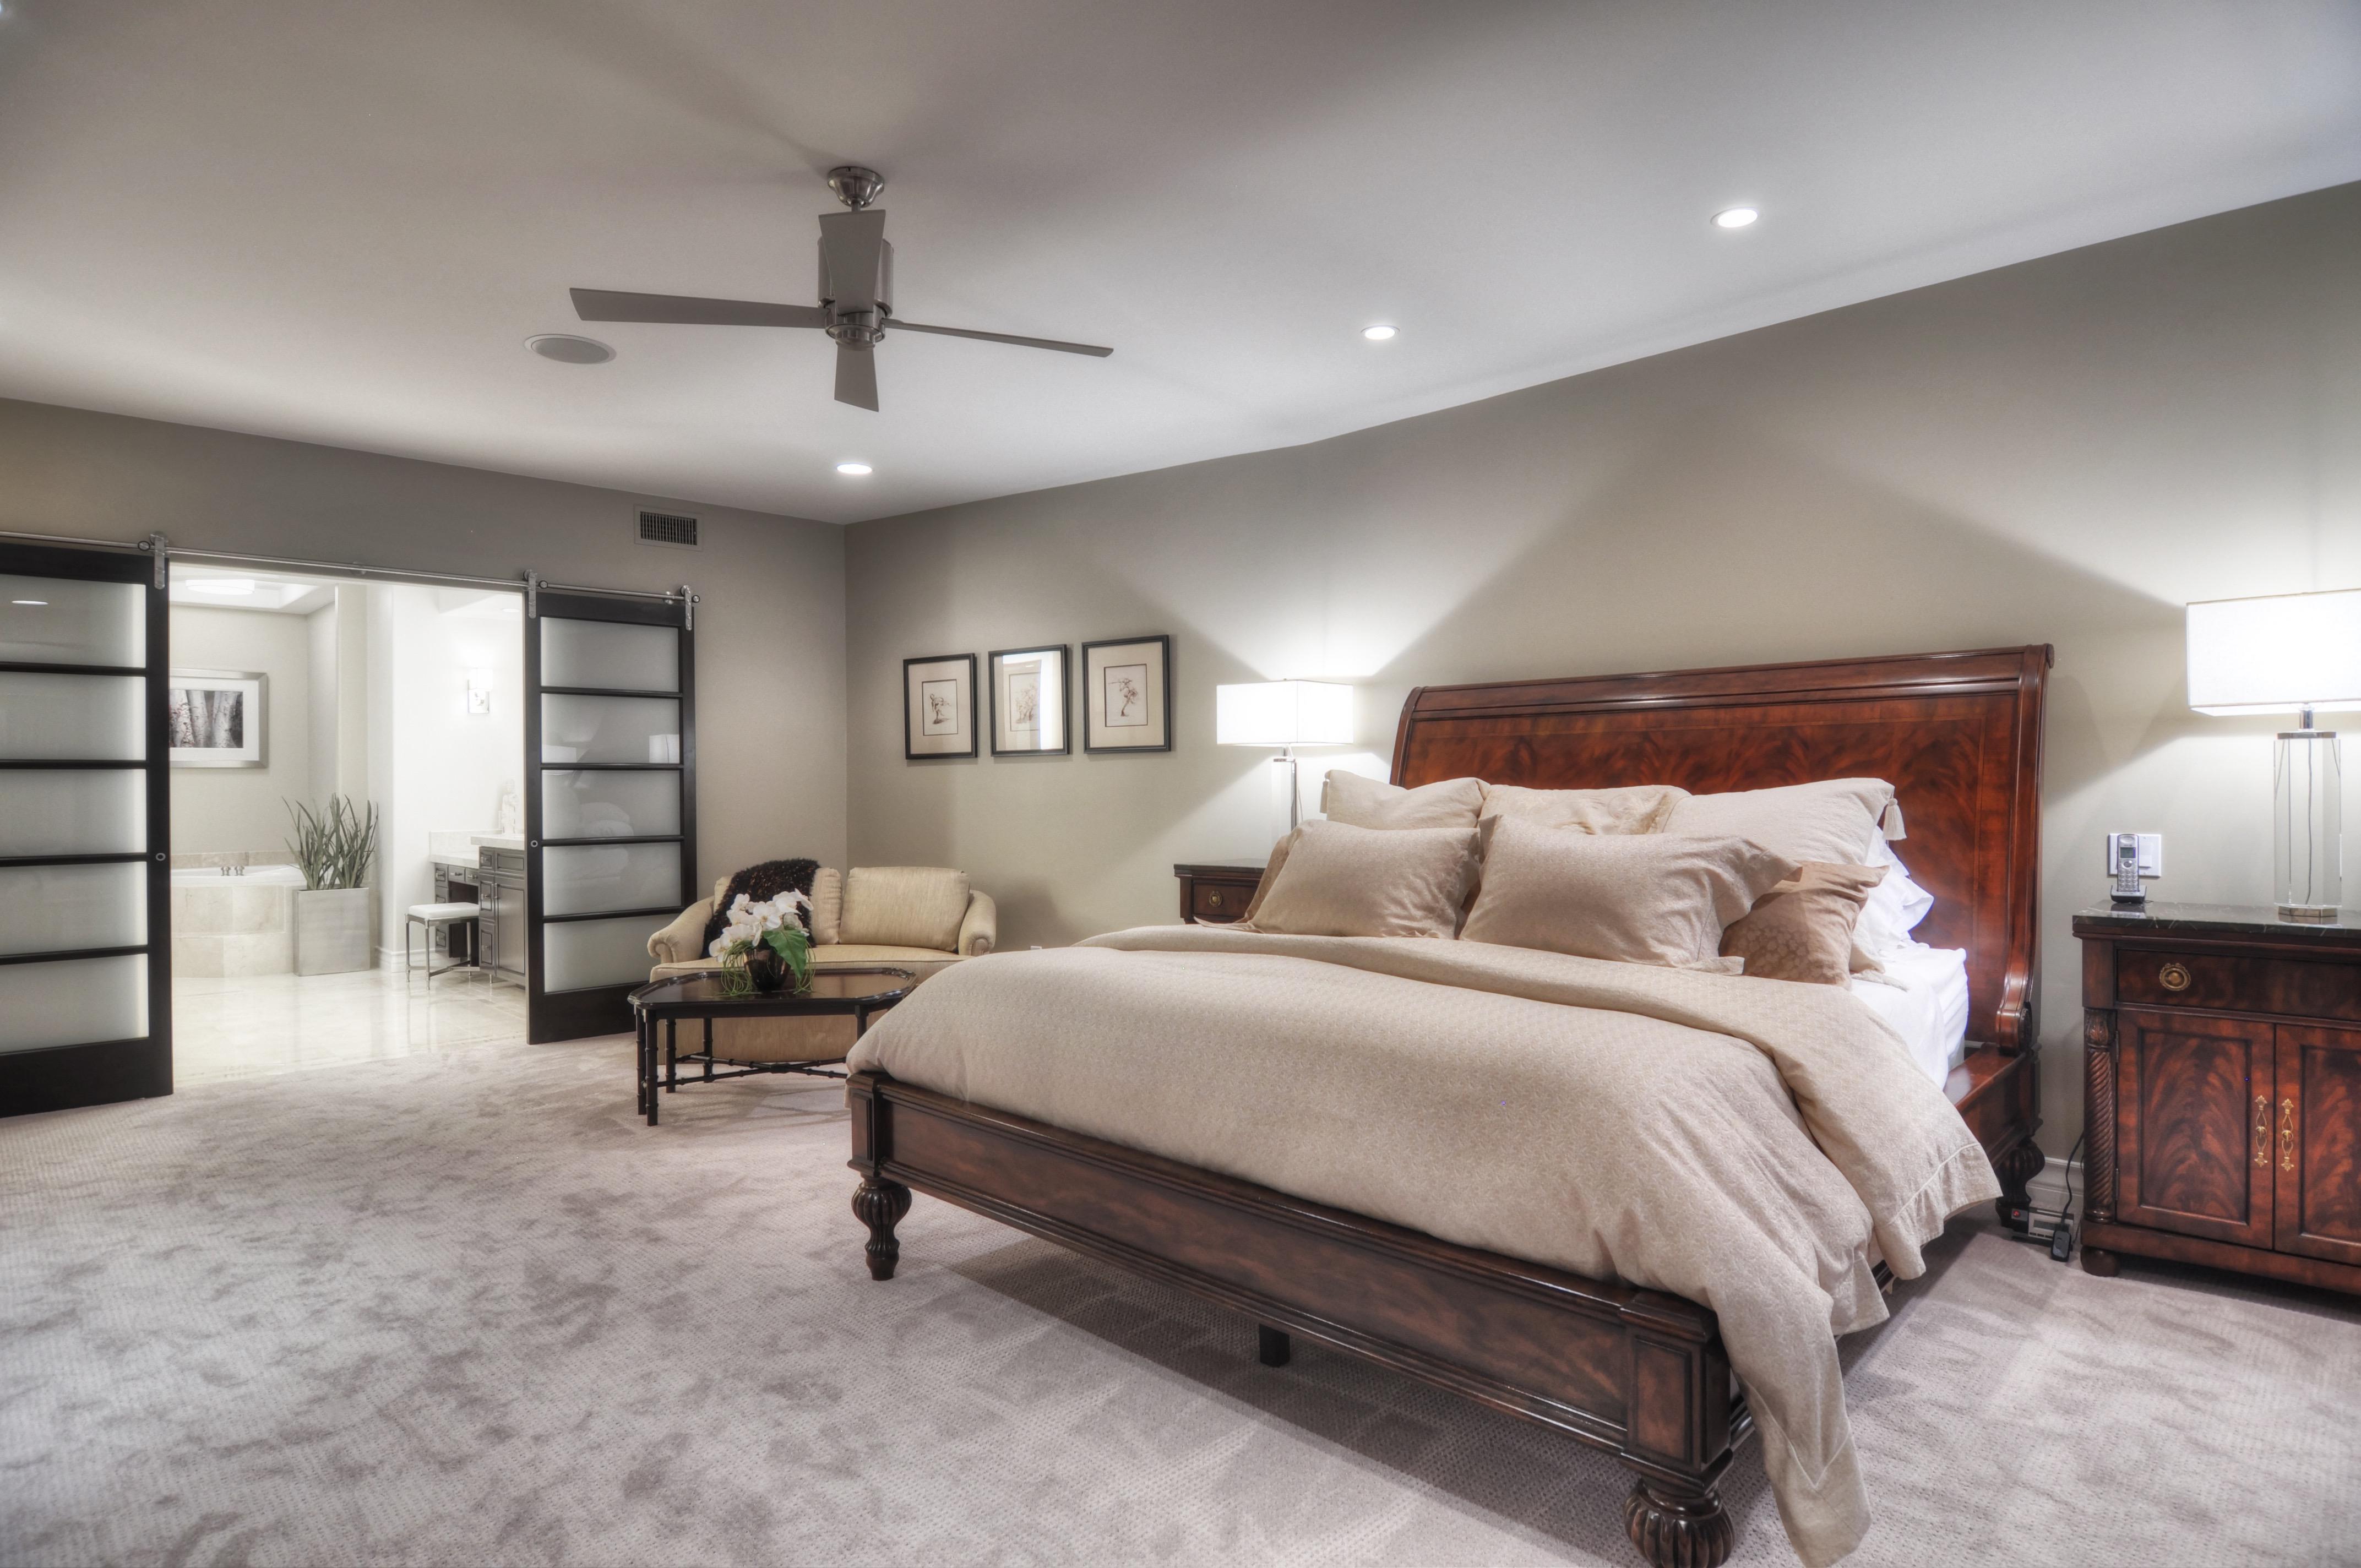 Sliding Shoji Screen Doors For Modern Bedroom Interior (Image 11 of 13)